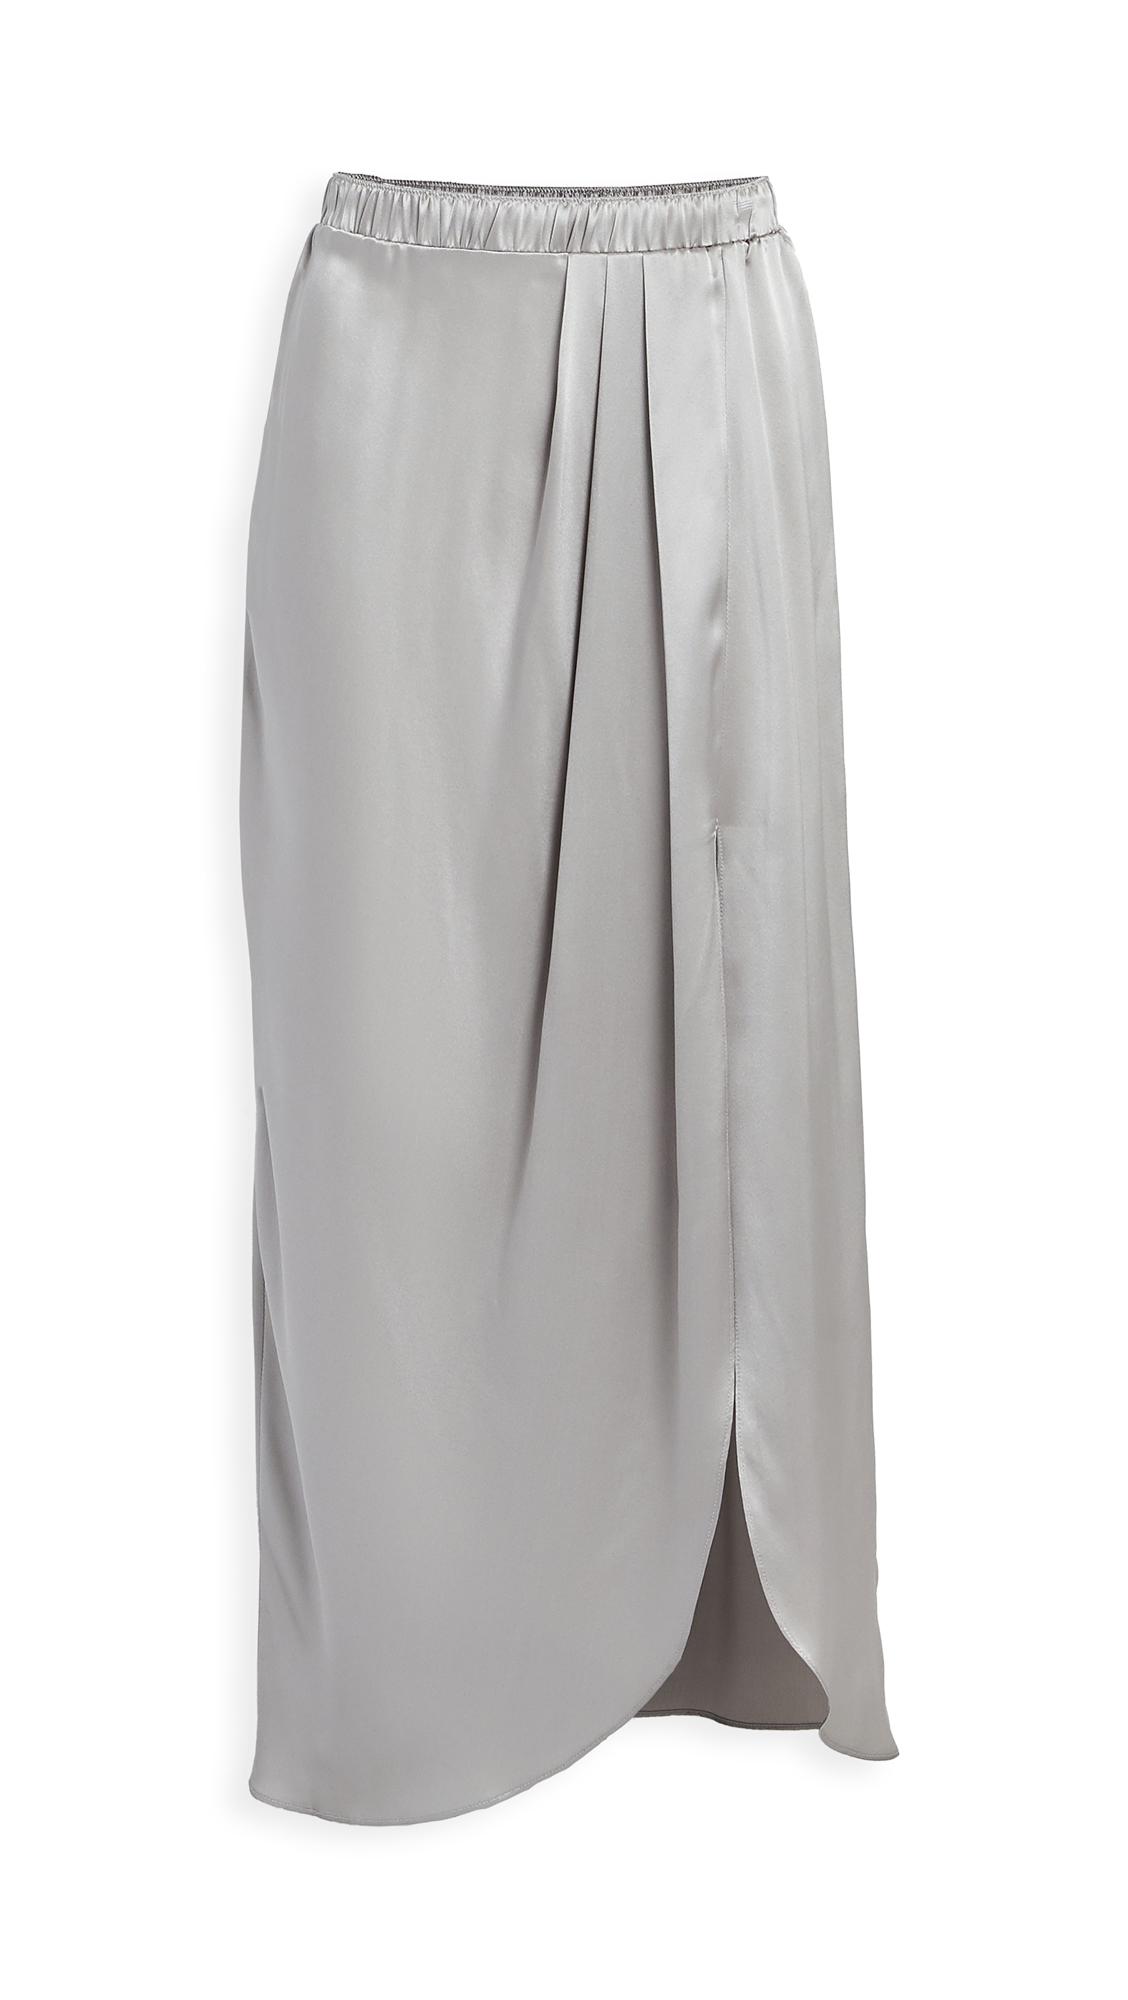 Sablyn Ariel Satin Pleated Slit Skirt